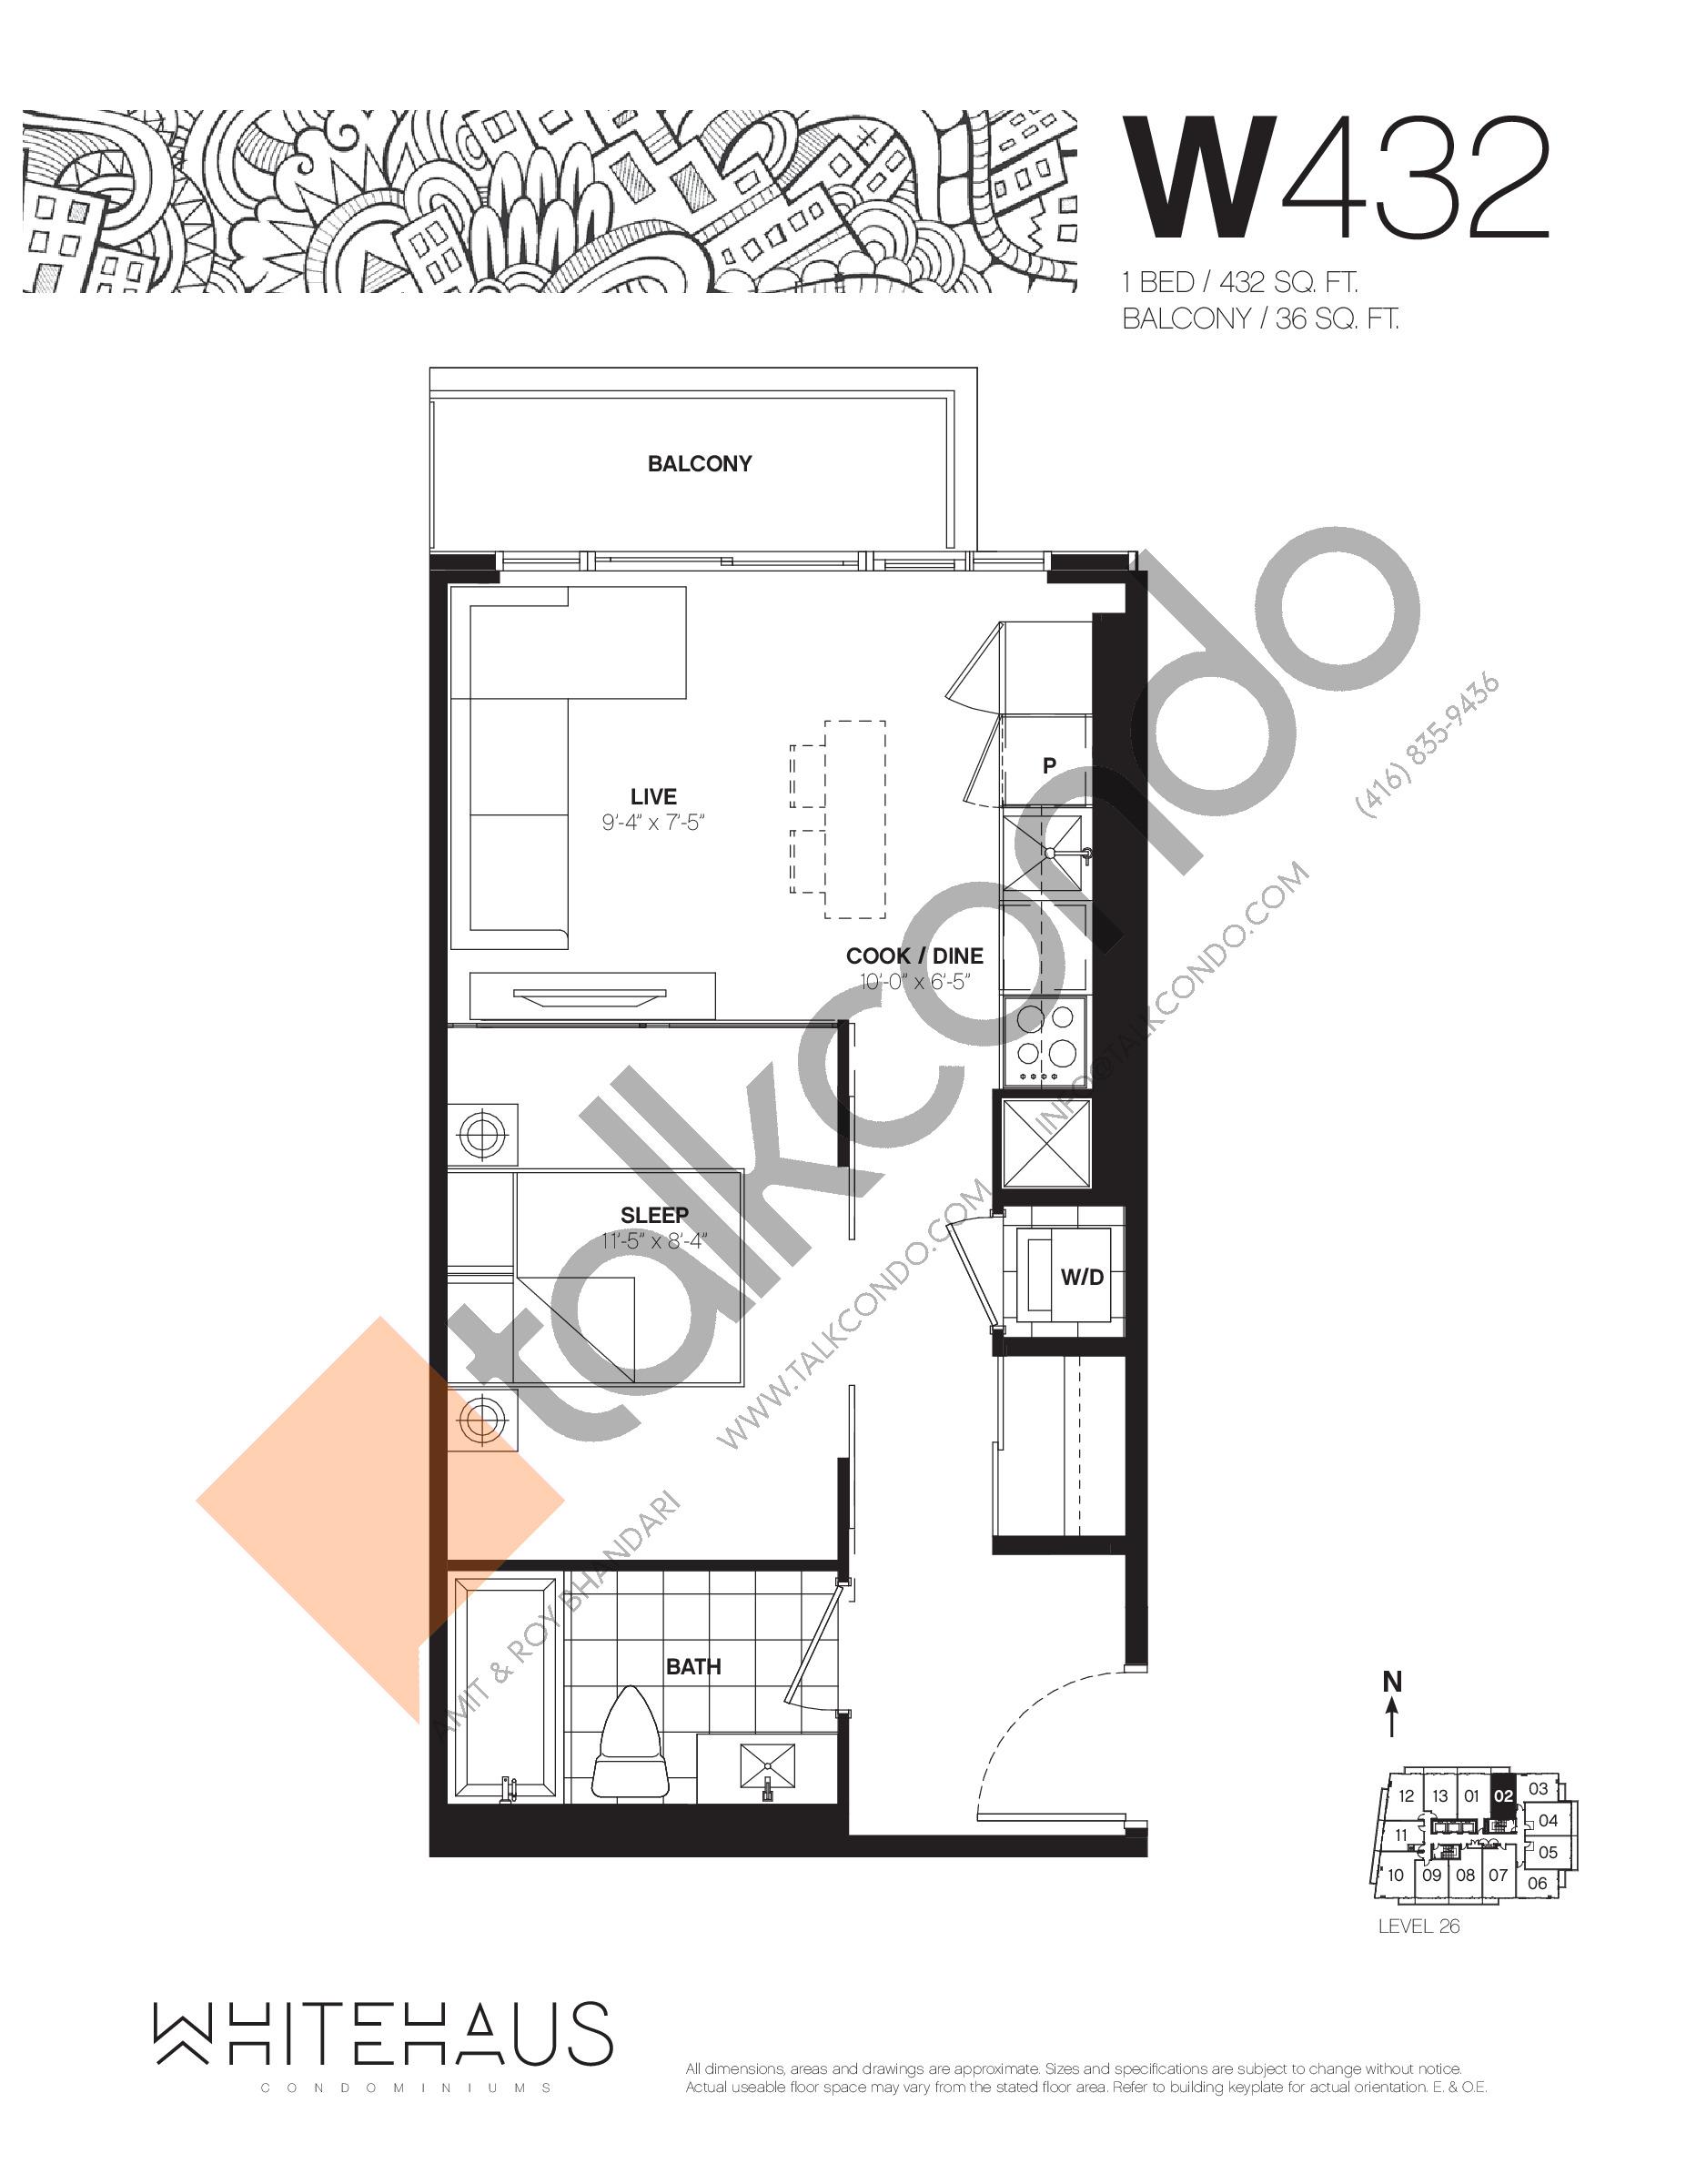 W432 Floor Plan at Whitehaus Condos - 432 sq.ft